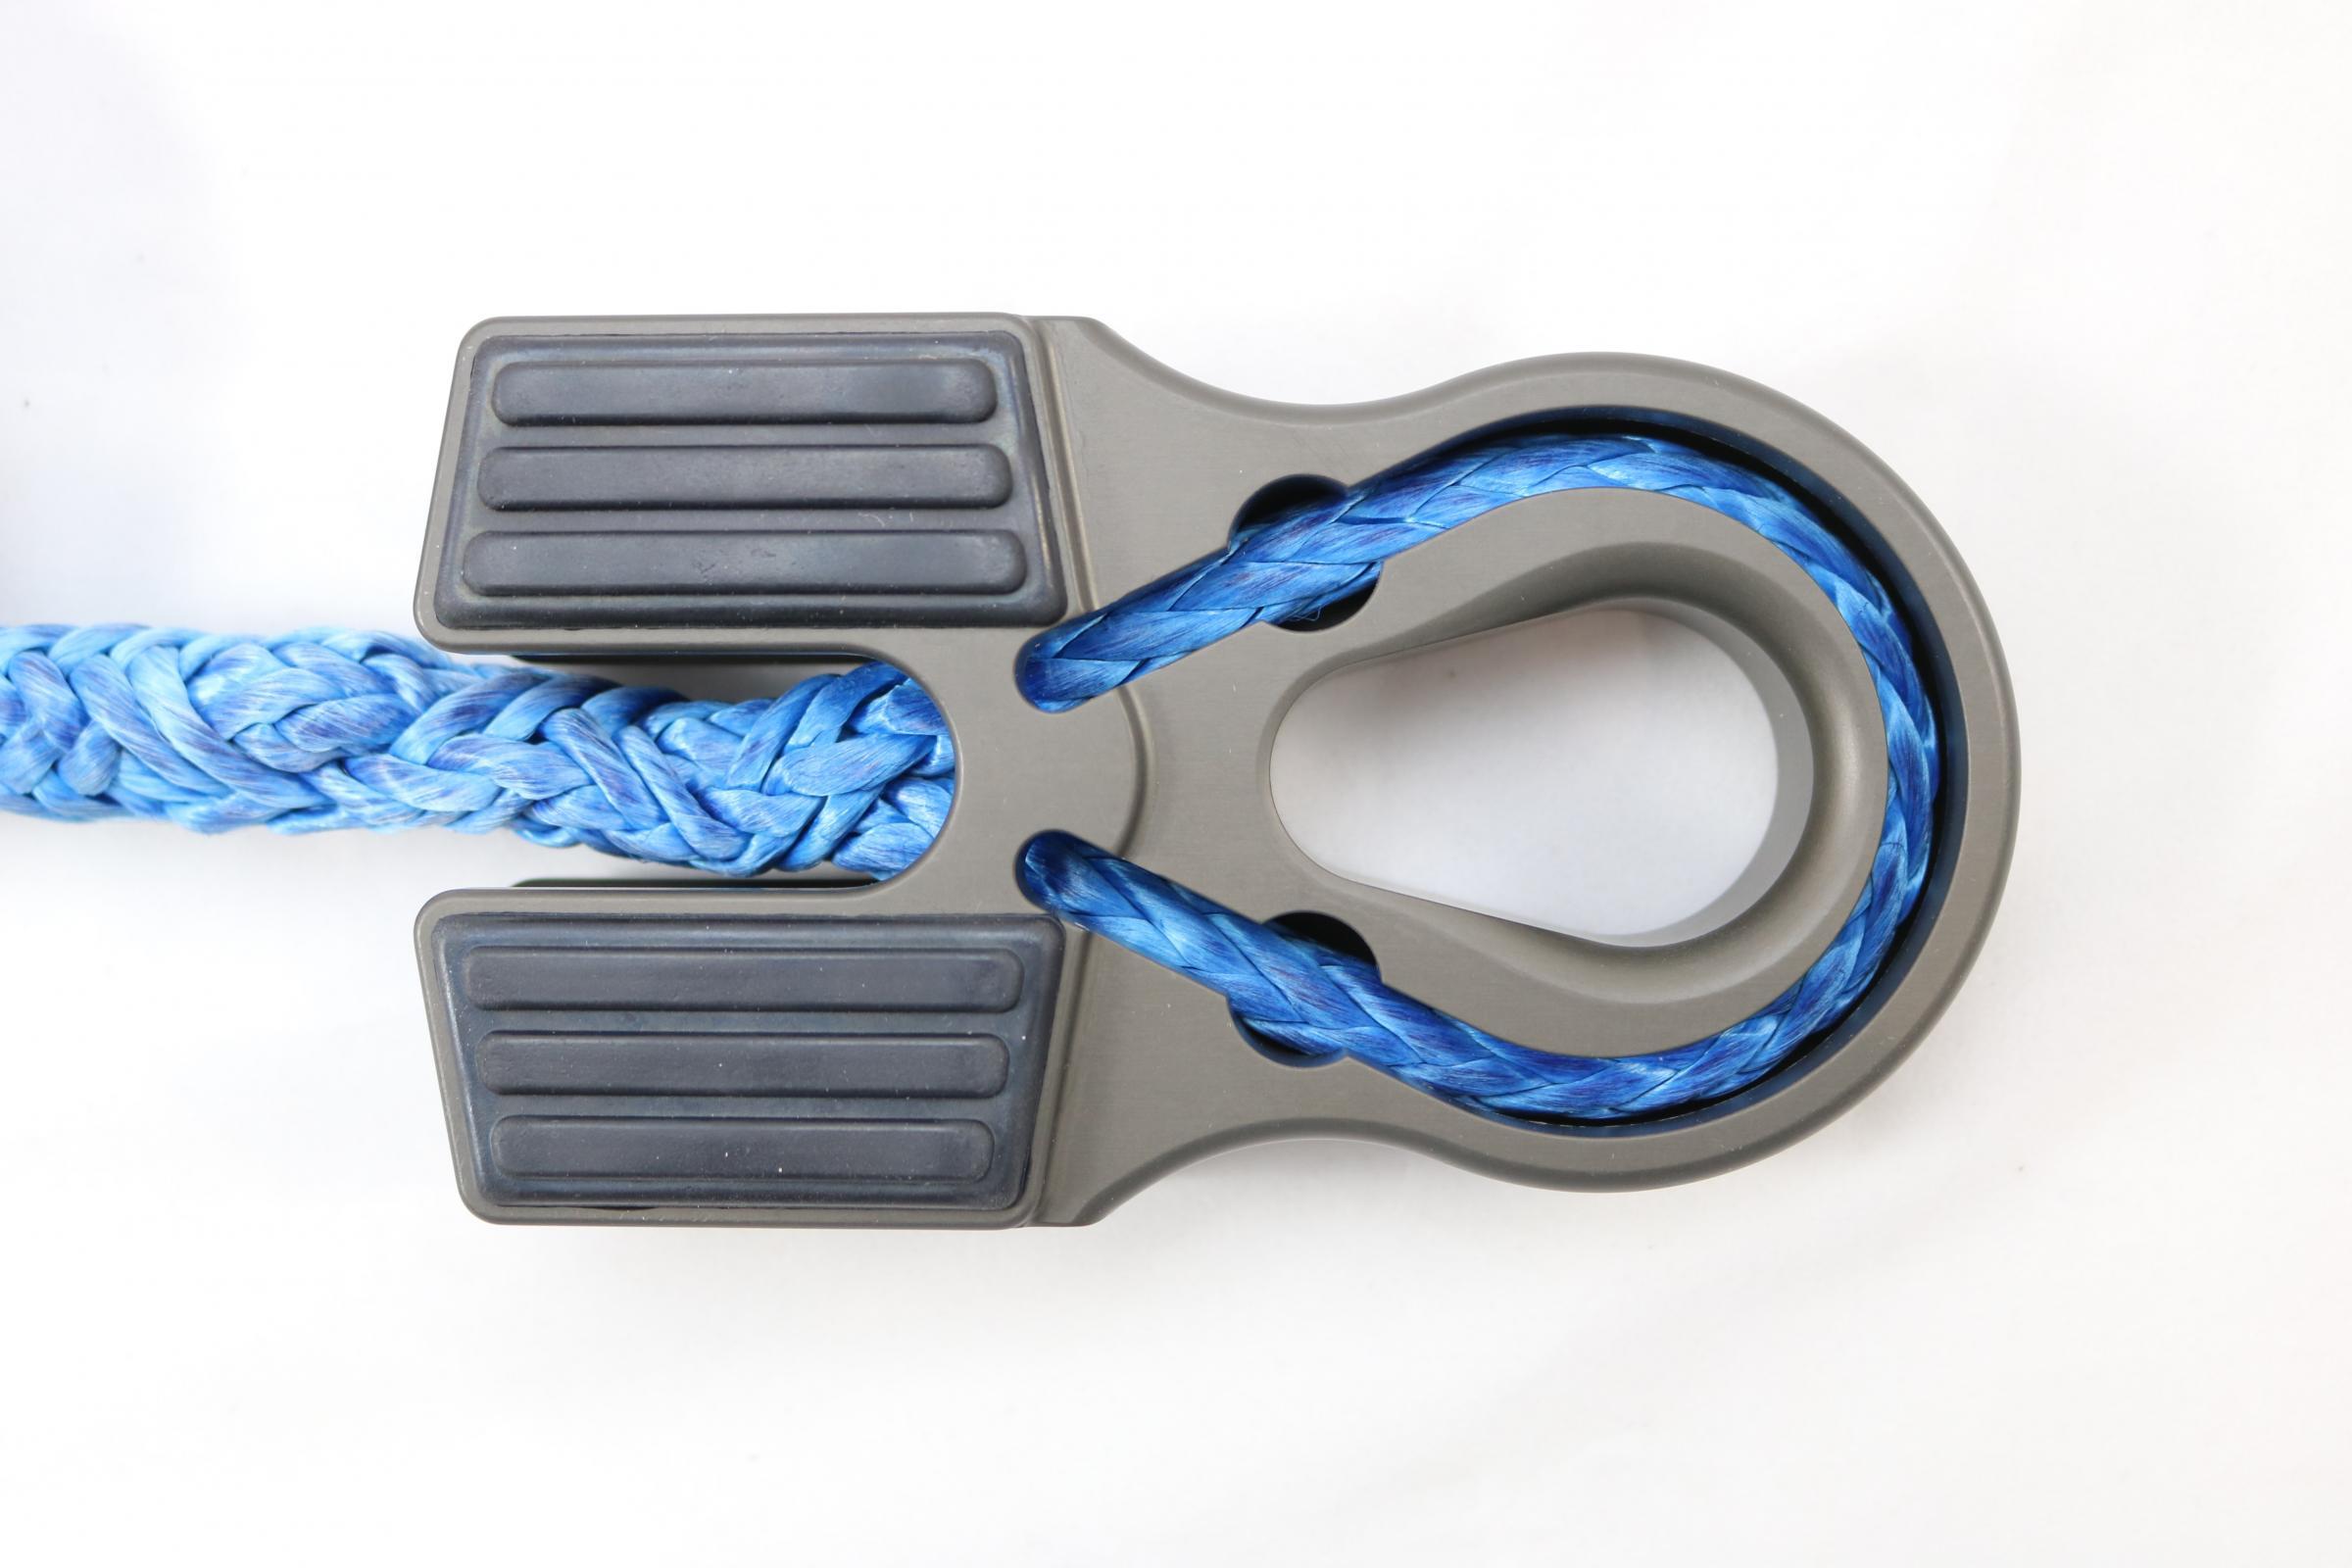 Factor 55 00375-06 - Winch Line Shackle Mount Splice On Foldable Gray